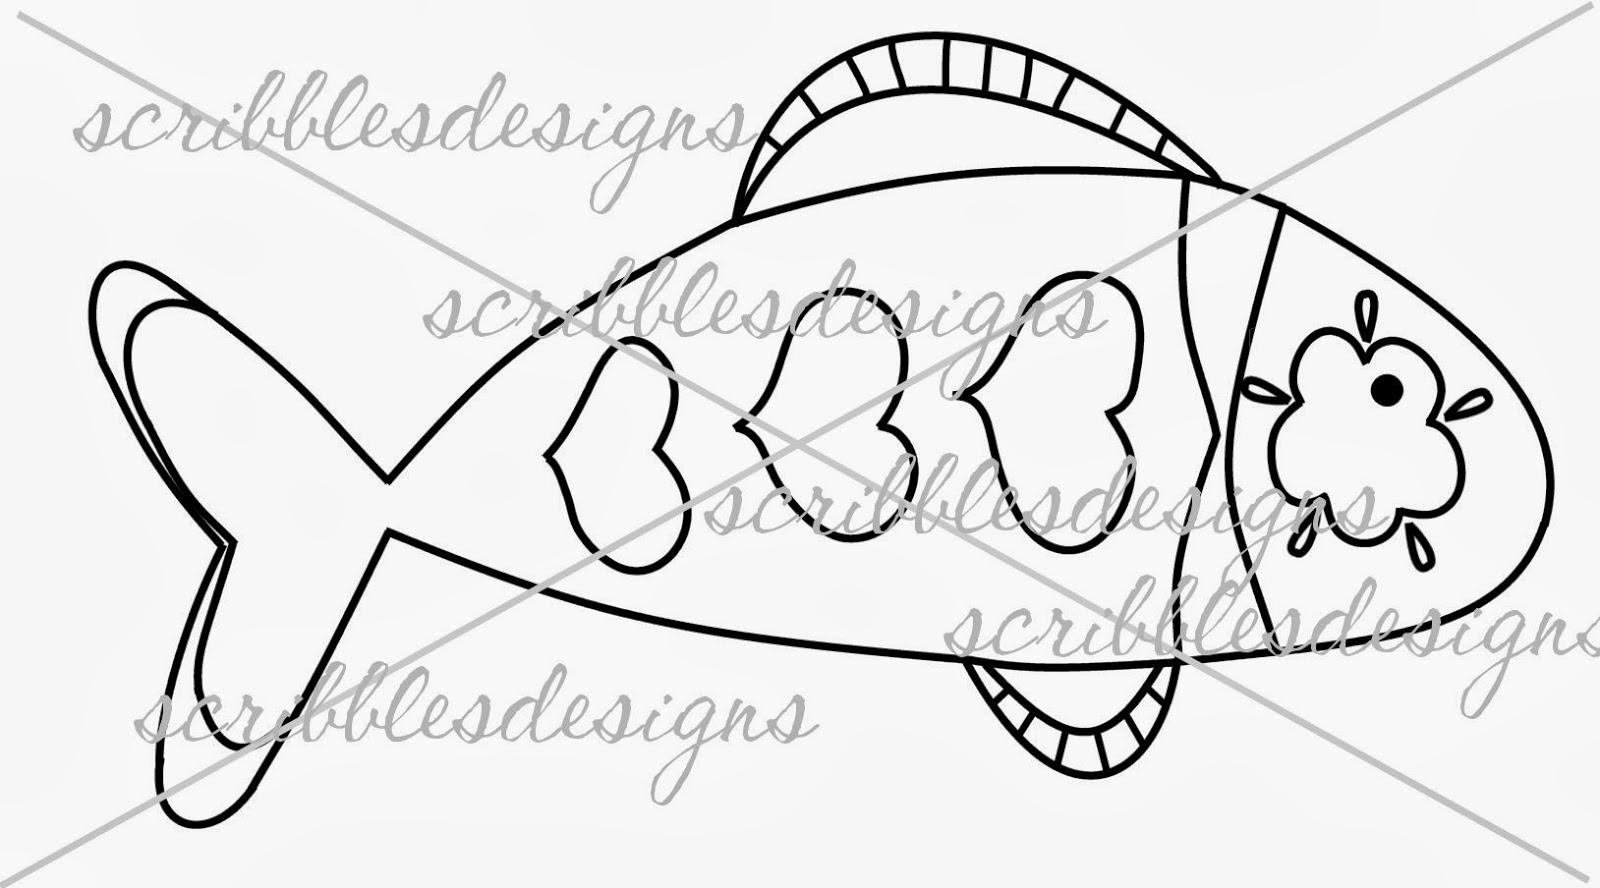 http://buyscribblesdesigns.blogspot.ca/2013/08/315-tropical-fish-4-200.html